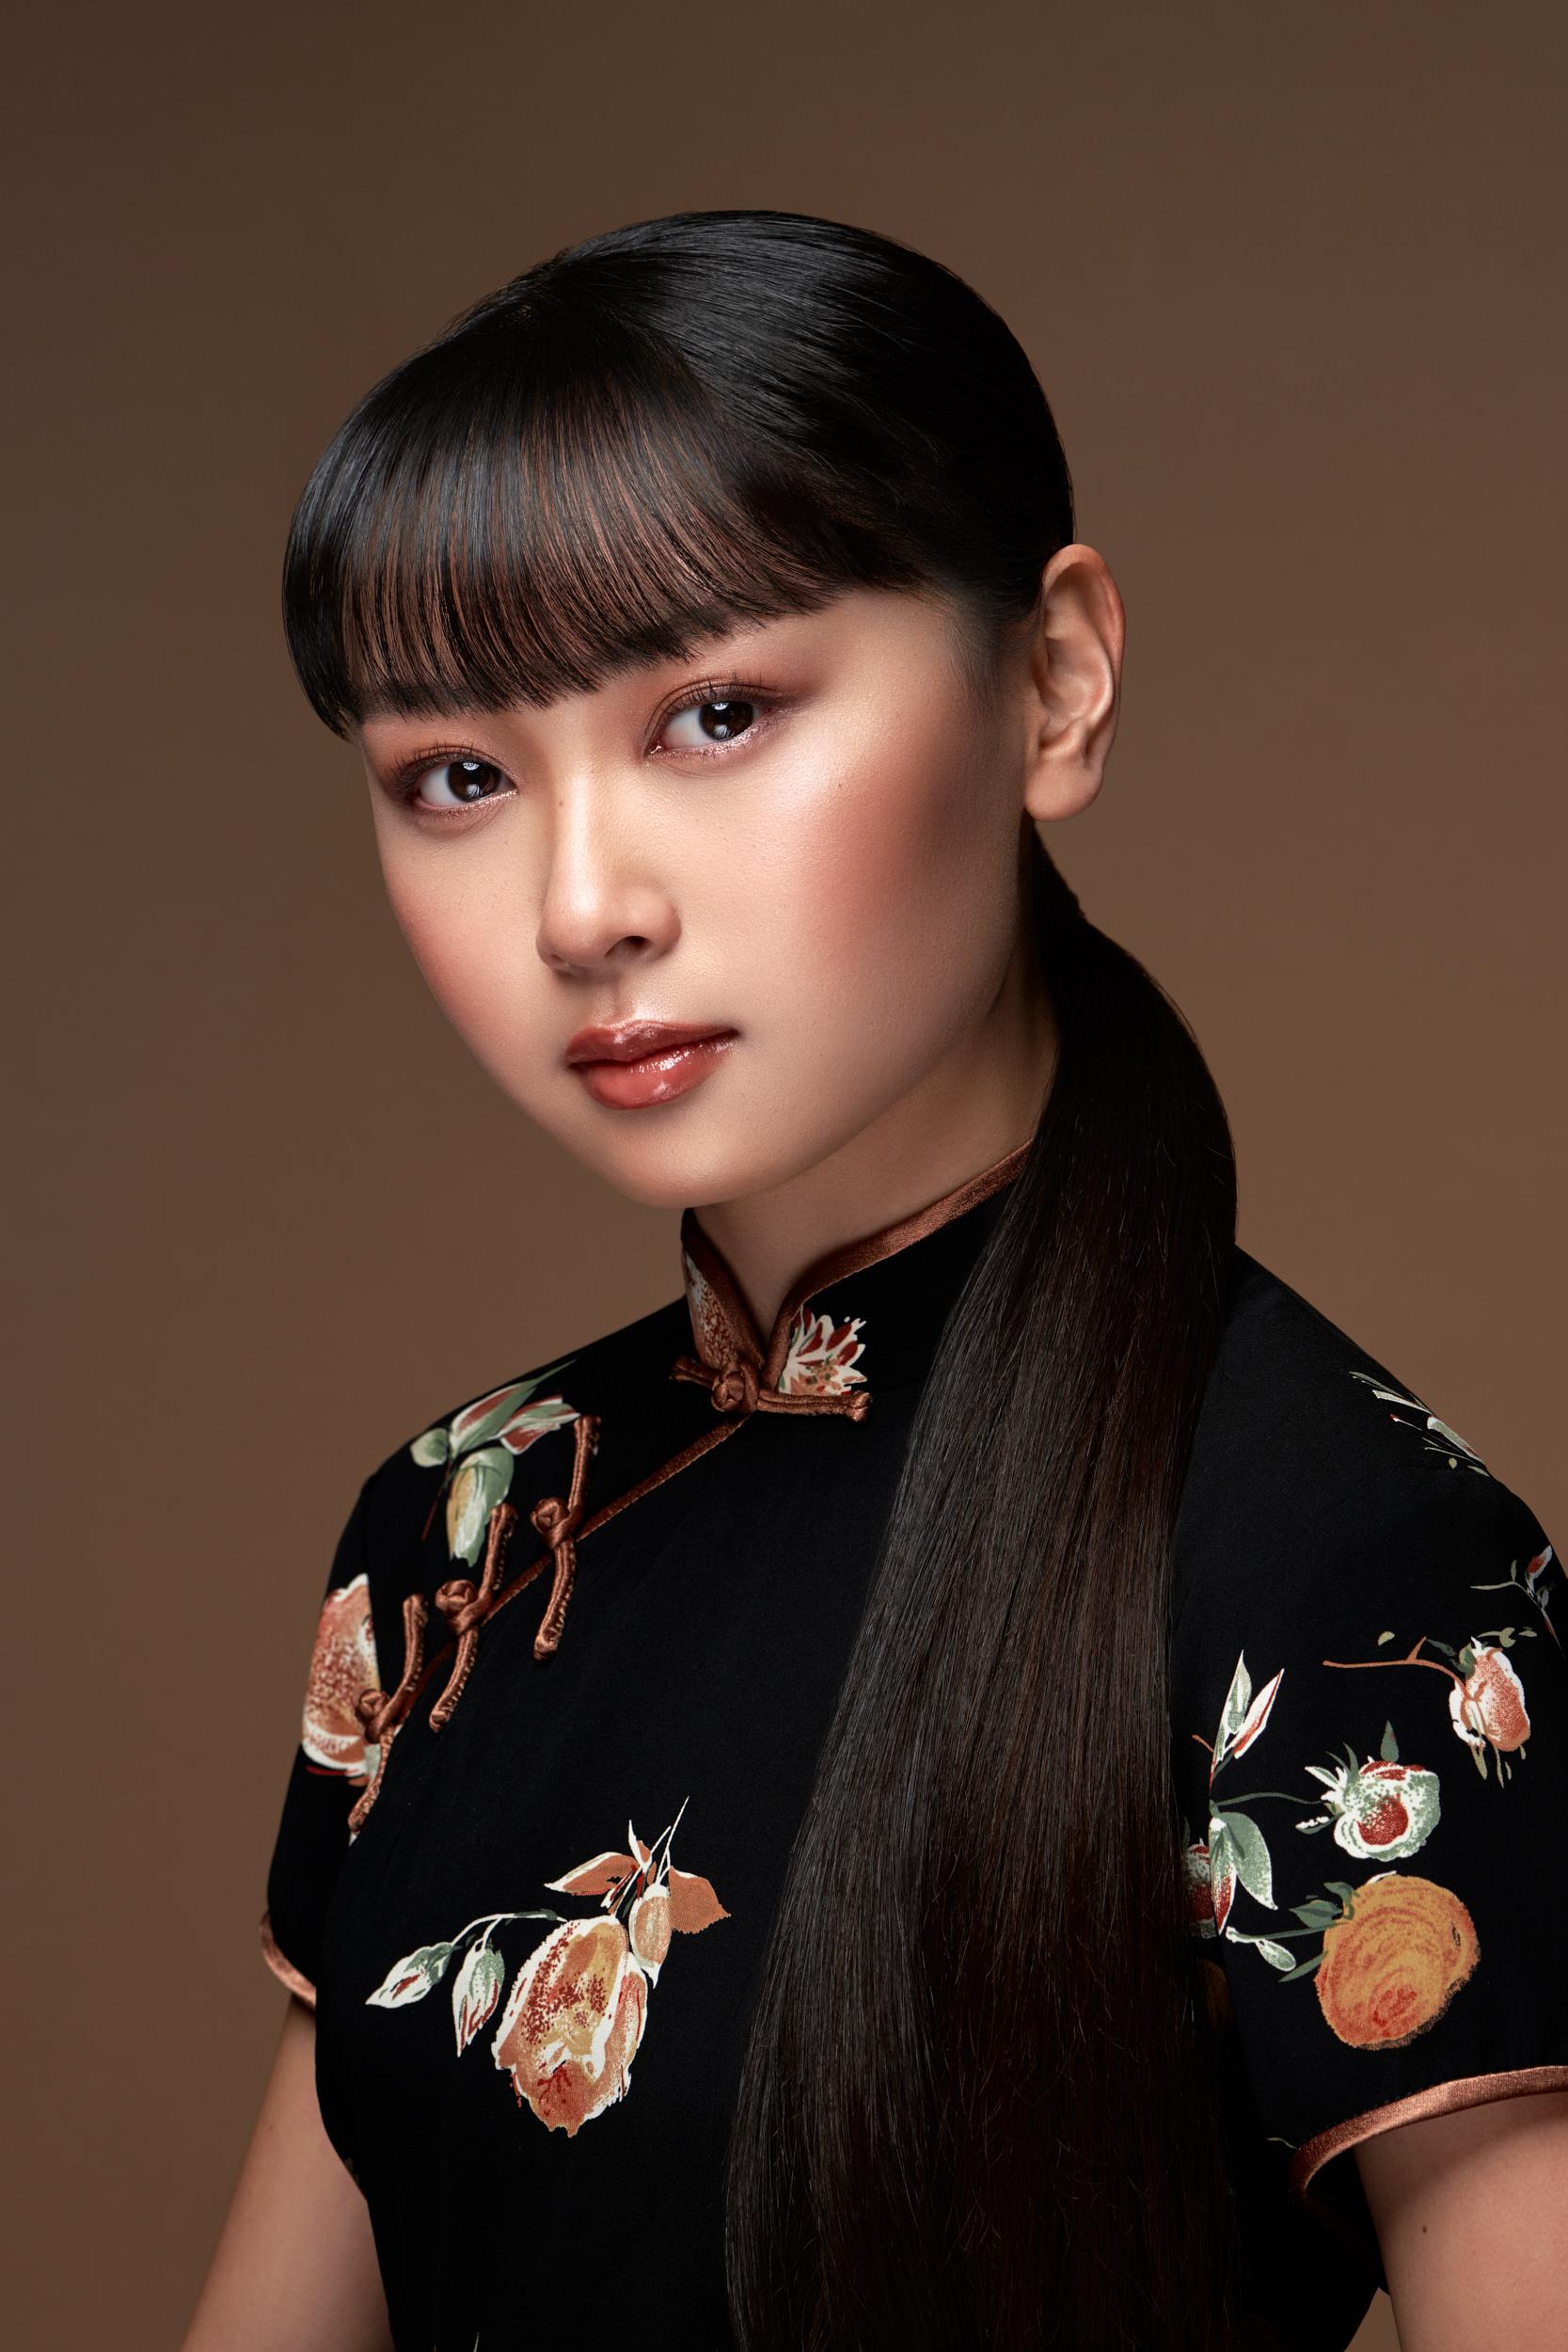 20181227-Rylee-Takahashi-Dance2163-.jpg